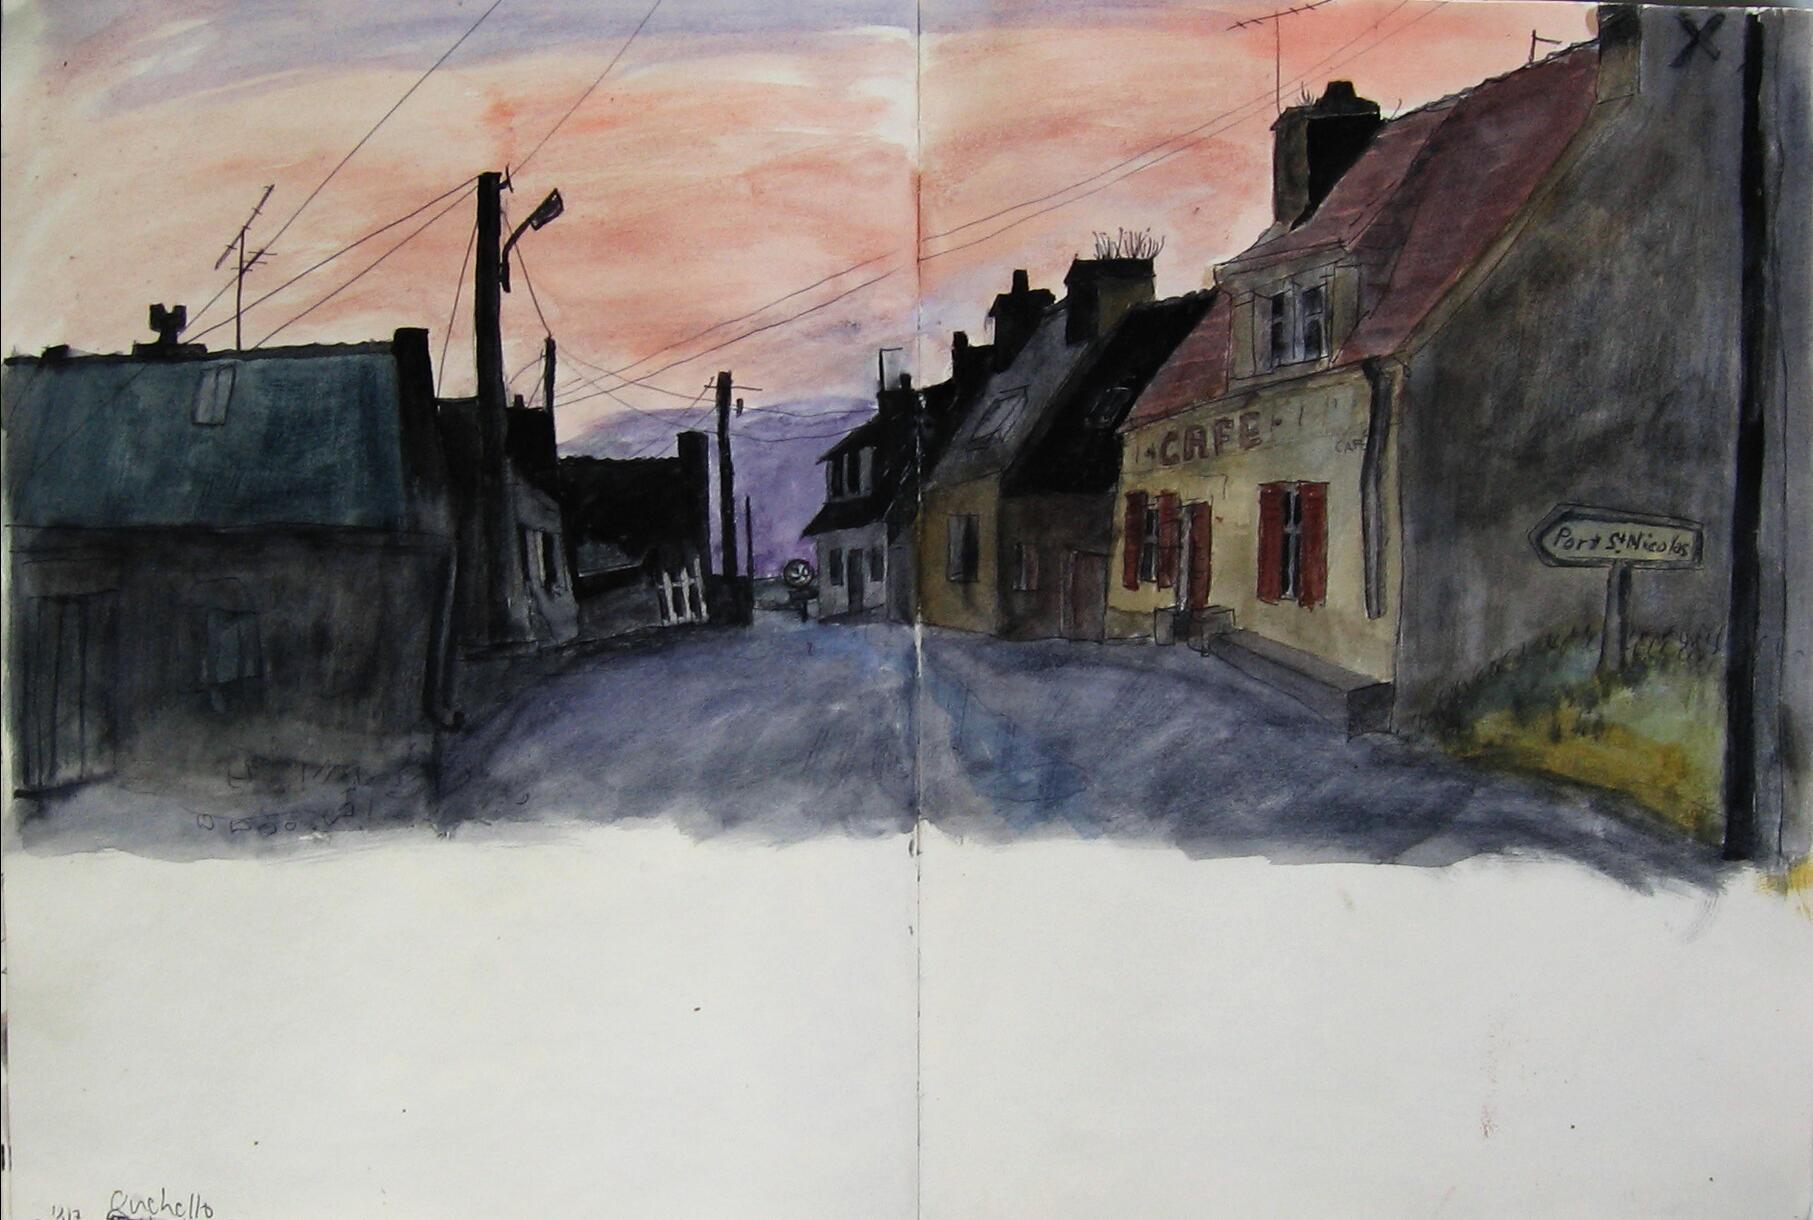 Groix, Quehello 1992